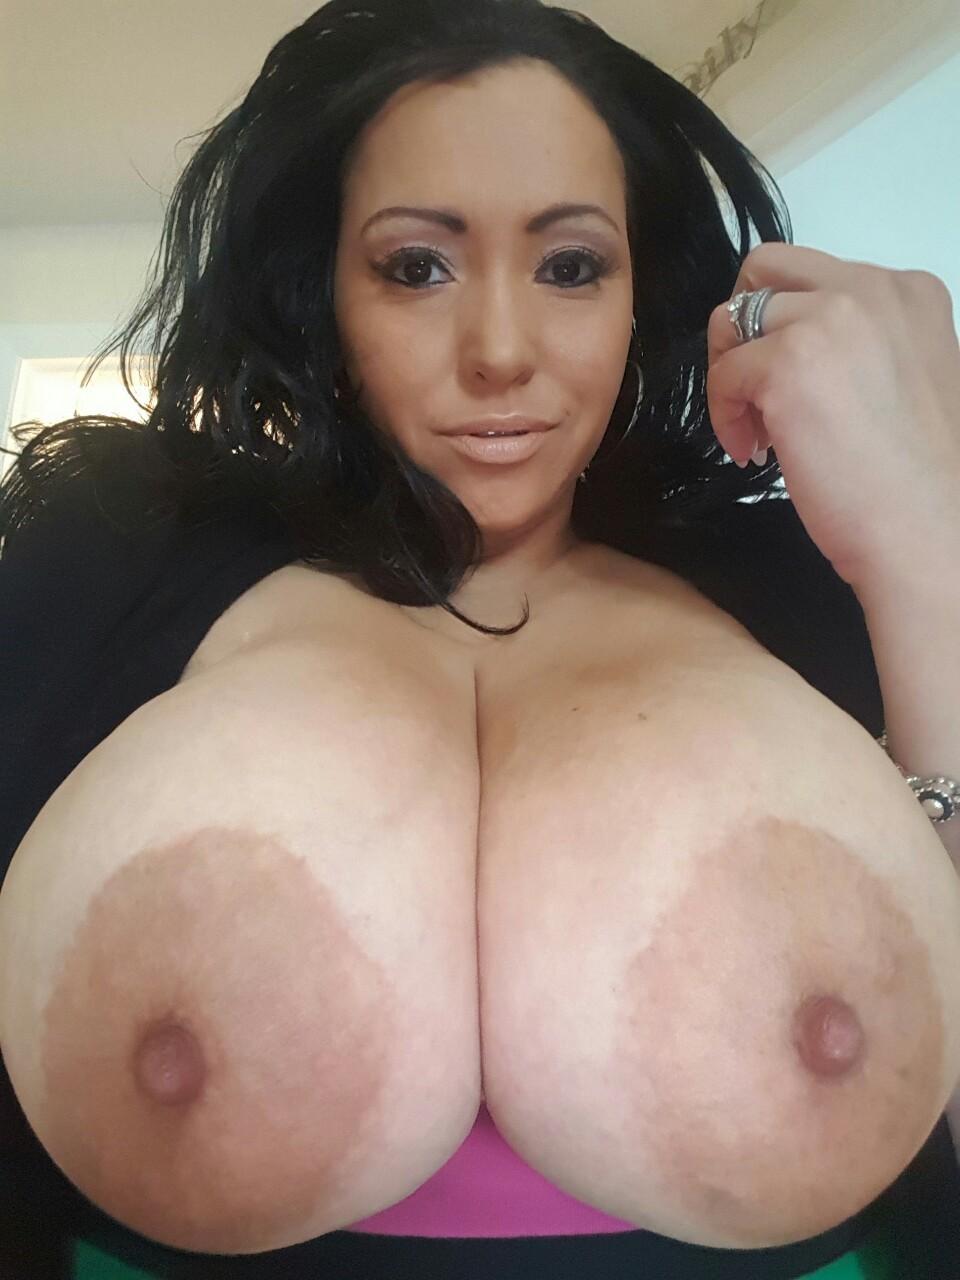 Huge Titty Tumblr Milf Crazyjenn52000 - Shesfreaky-9657